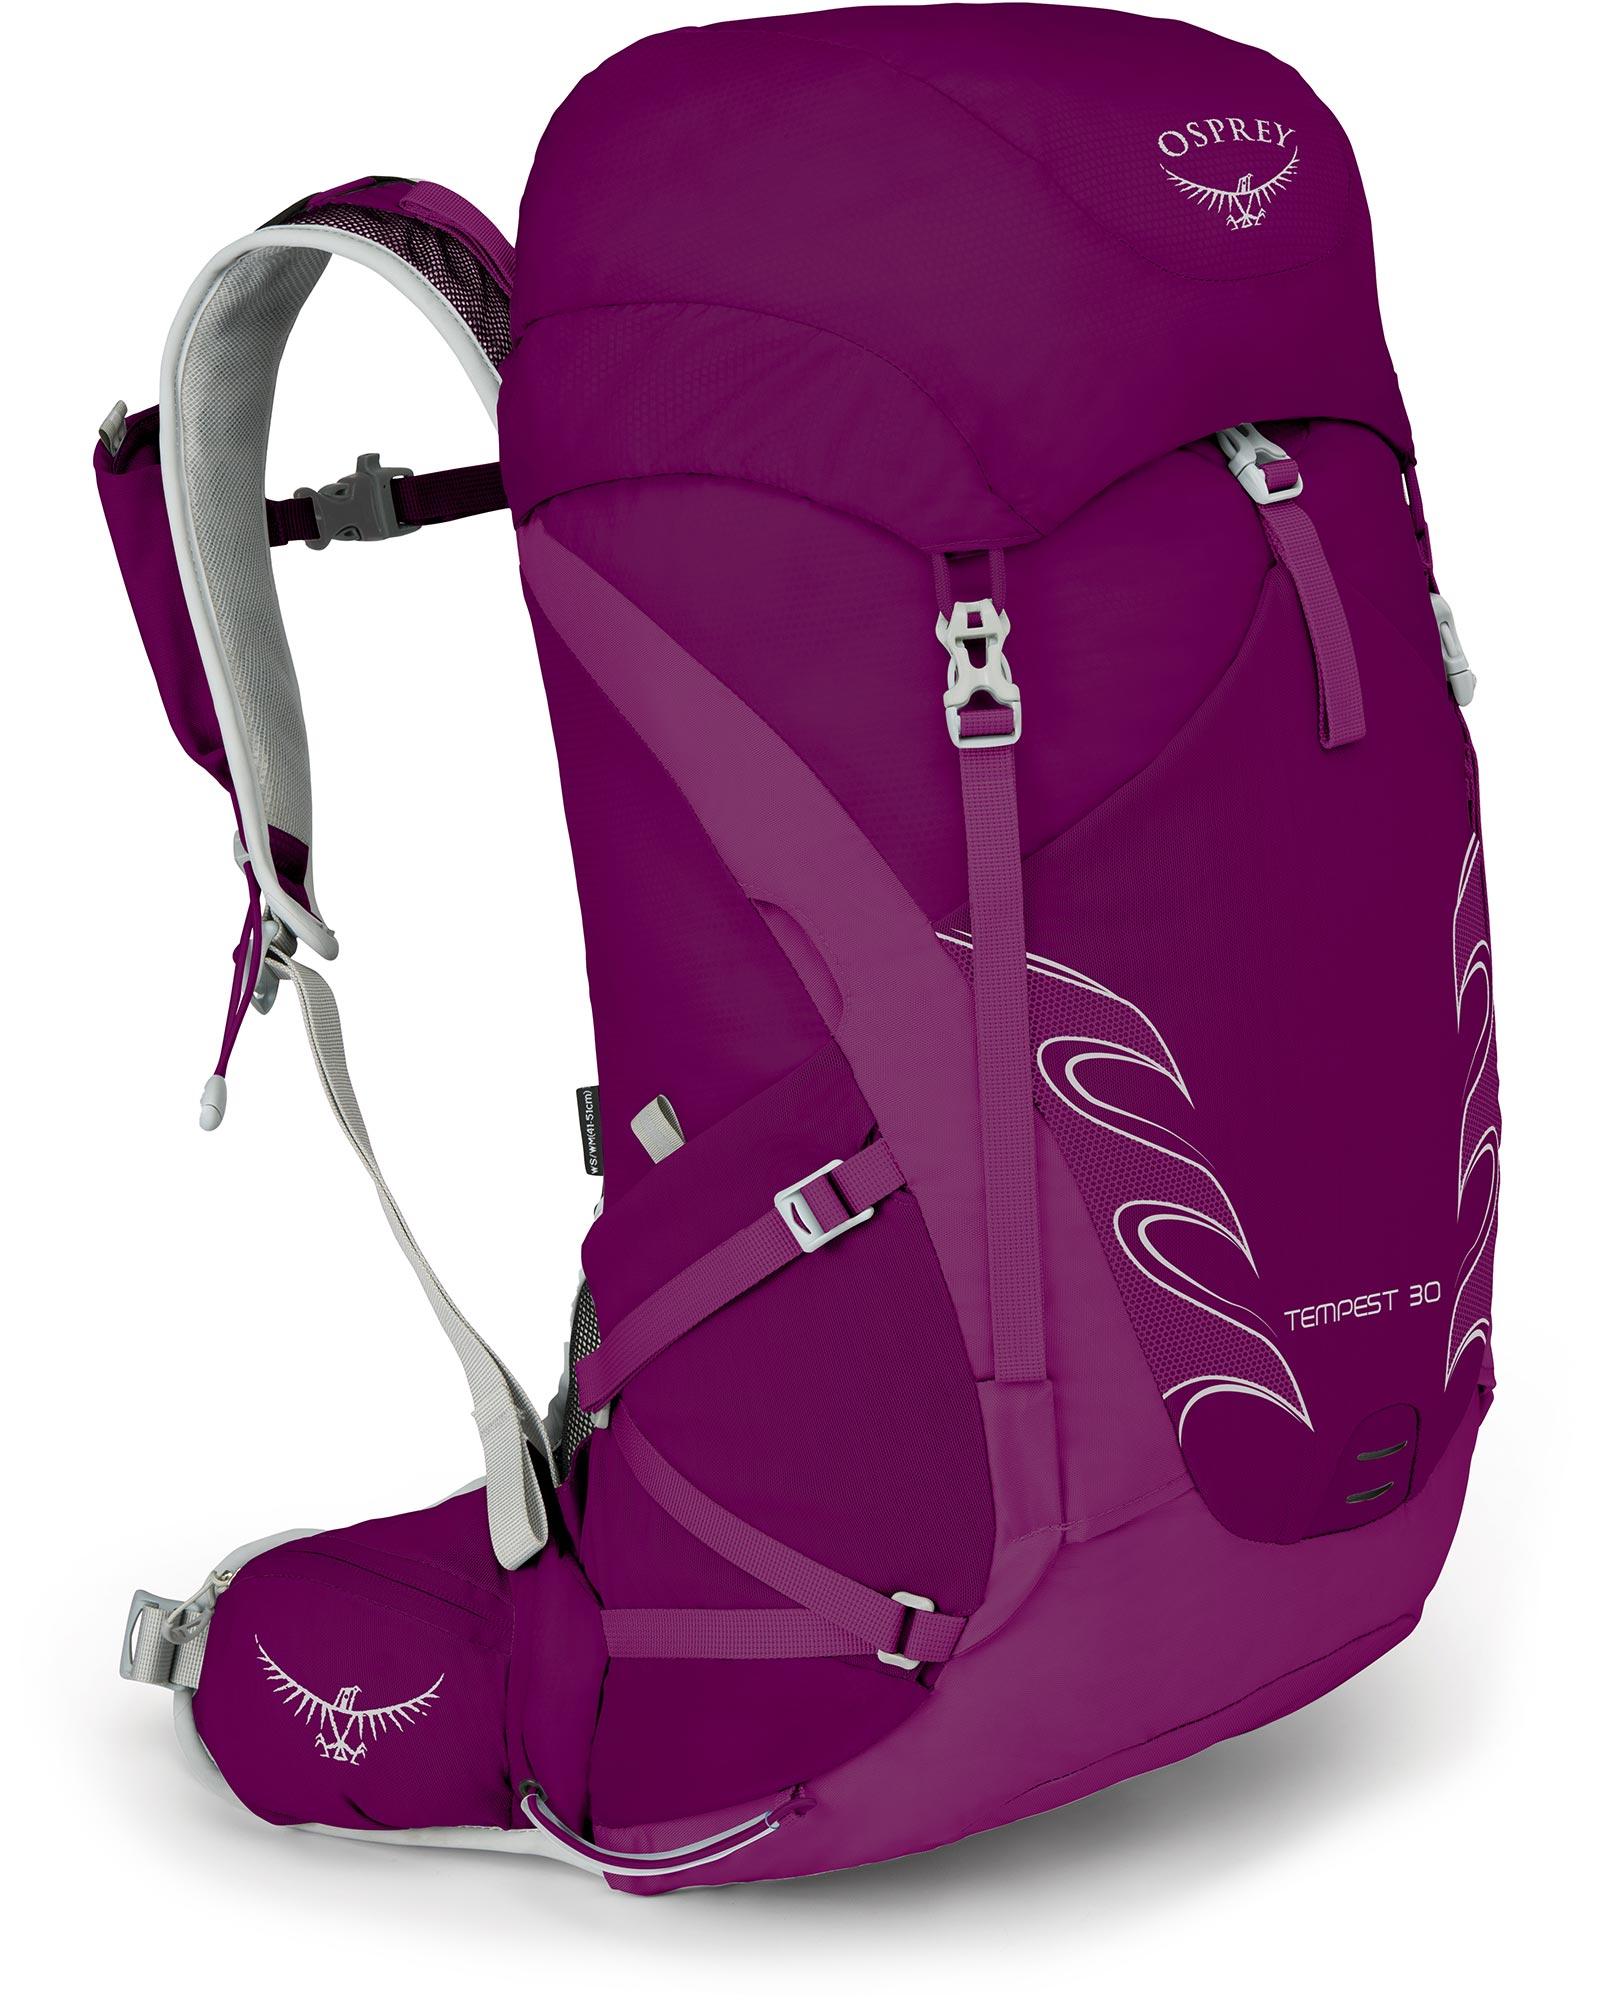 Osprey Women's Tempest 30 Backpack 0